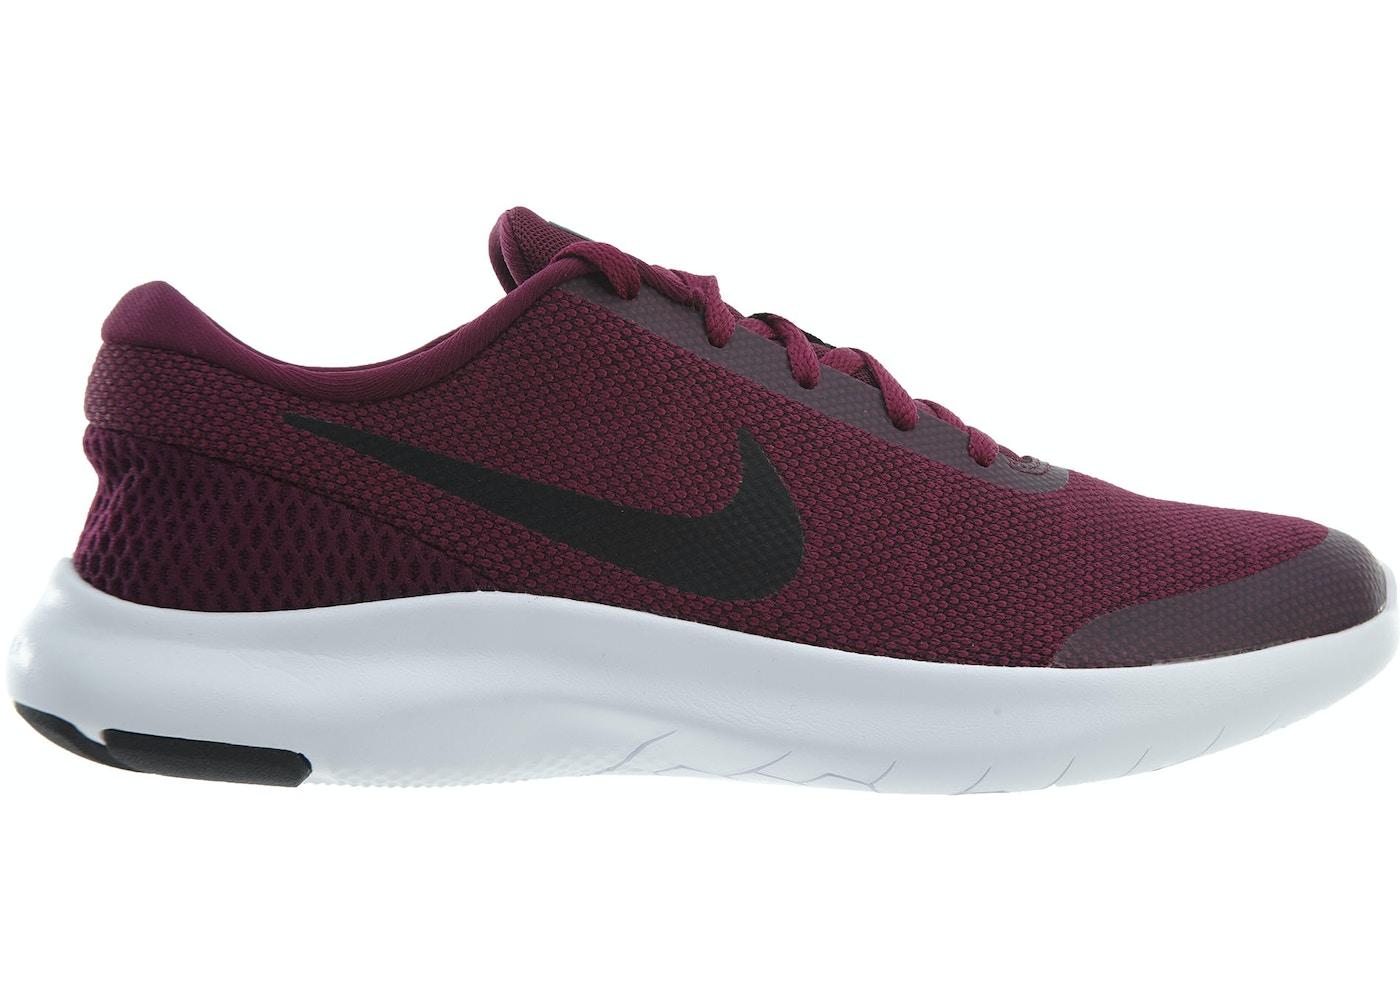 c6f3122ea47ae0 Nike Flex Experience Rn 7 Bordeaux Black - 908985-600